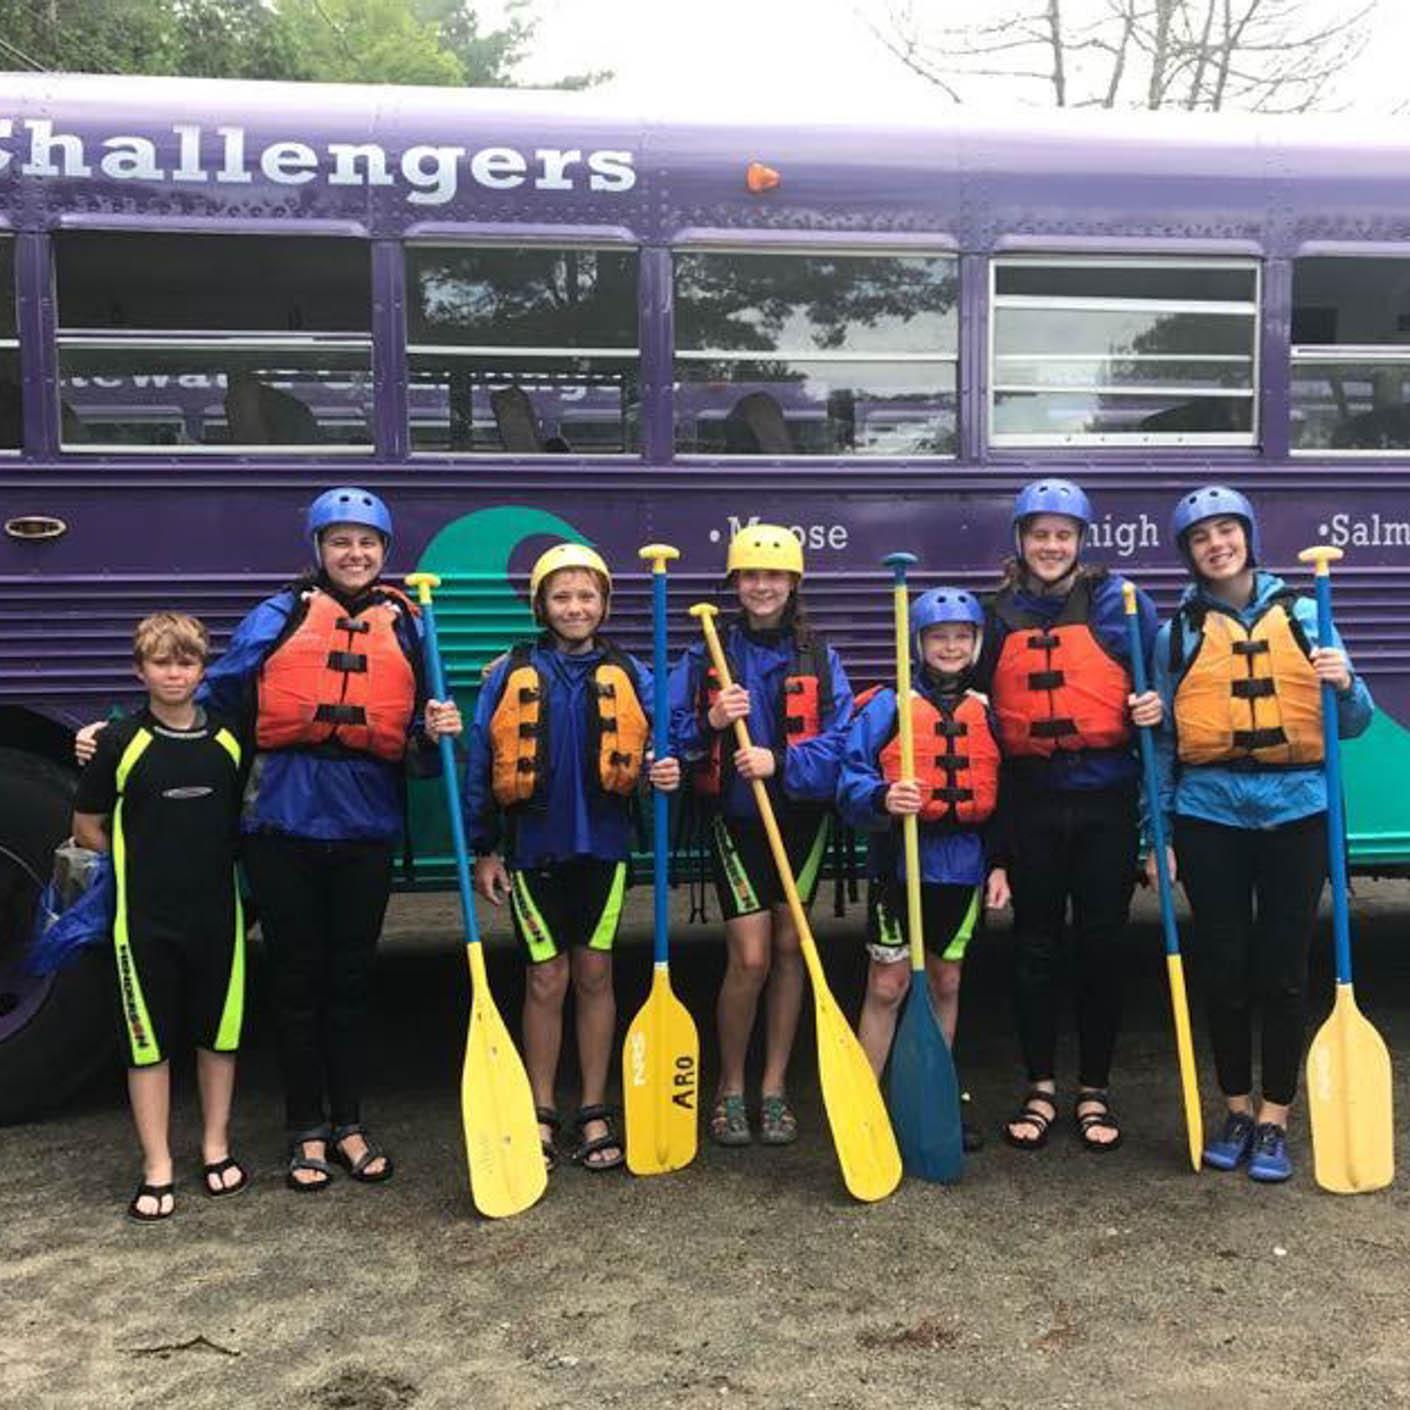 Adirondack Discovery whitewater rafting bus